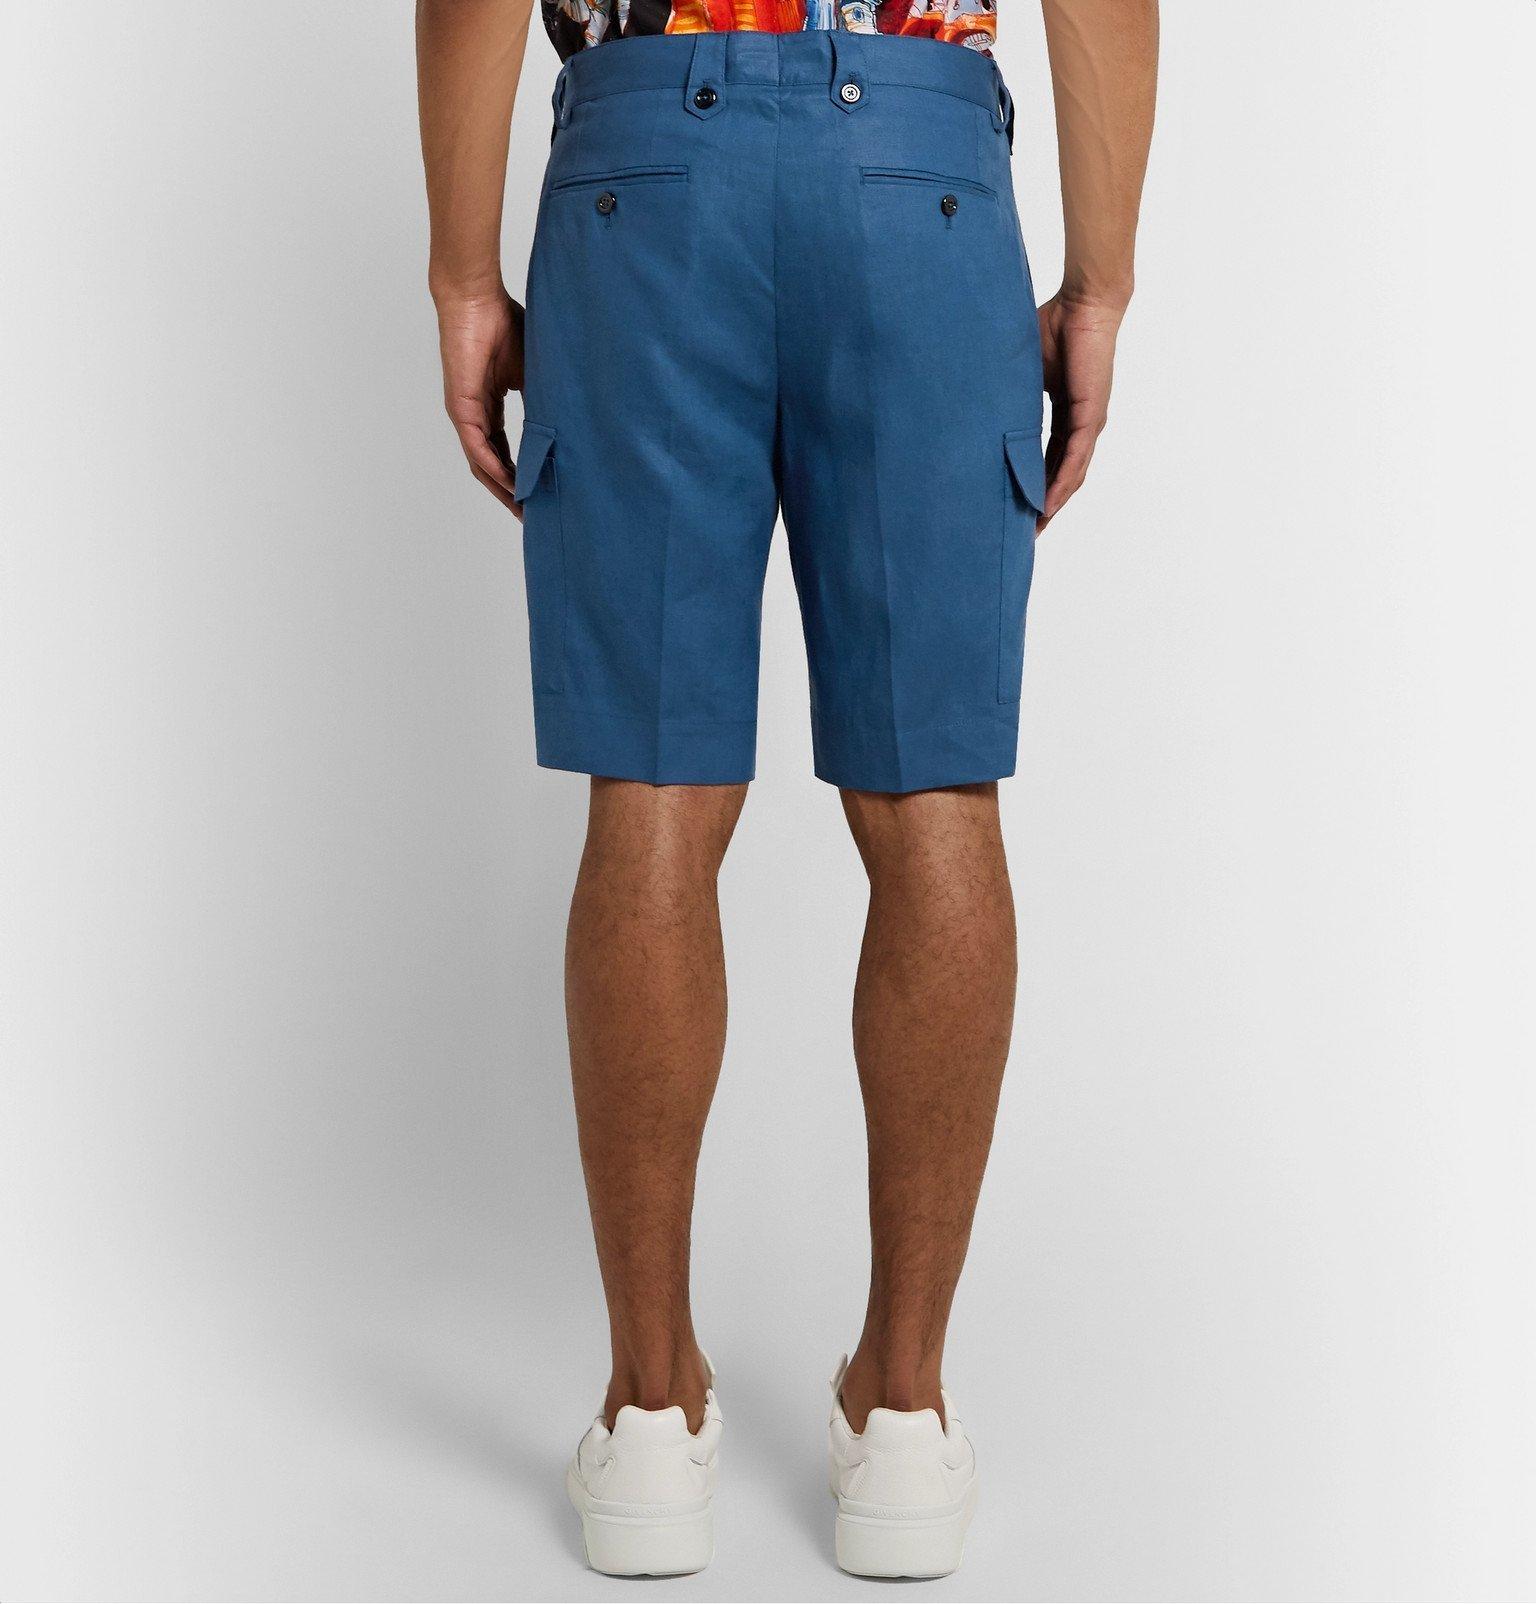 Dolce & Gabbana - Linen Shorts - Blue